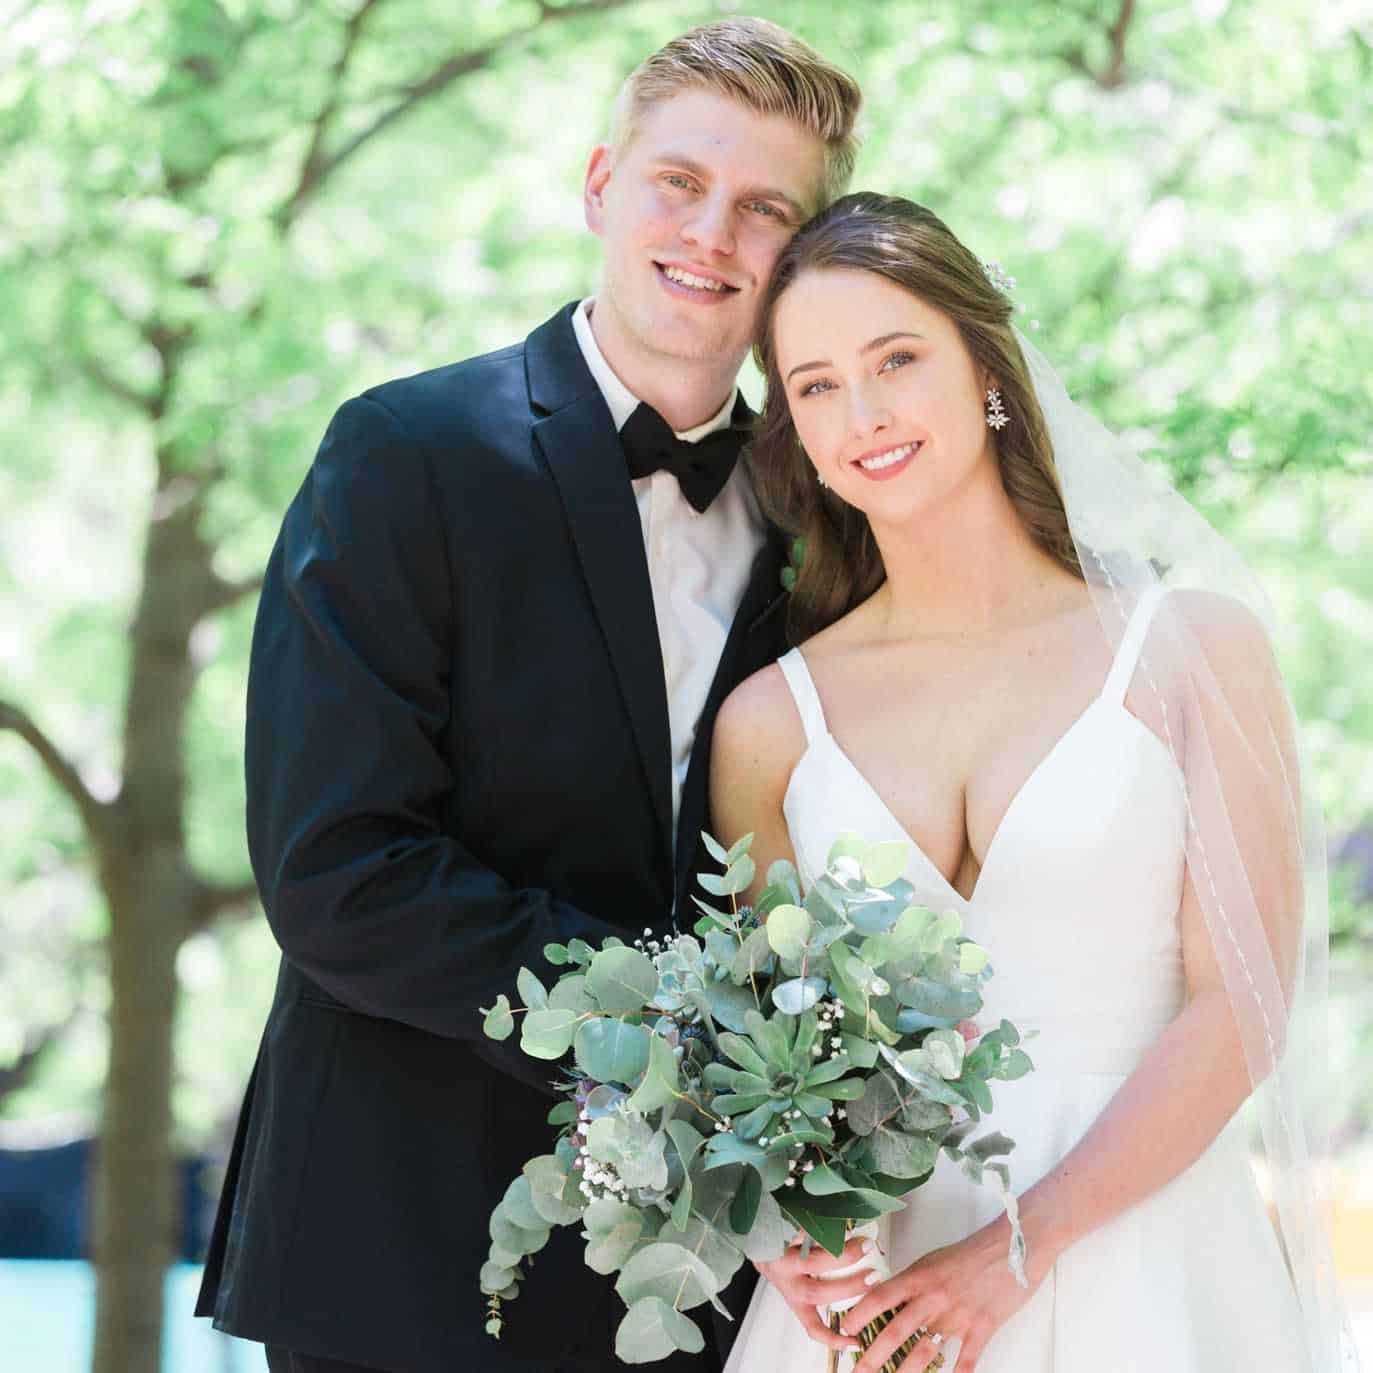 Toronto Wedding Planner - Partial Planning